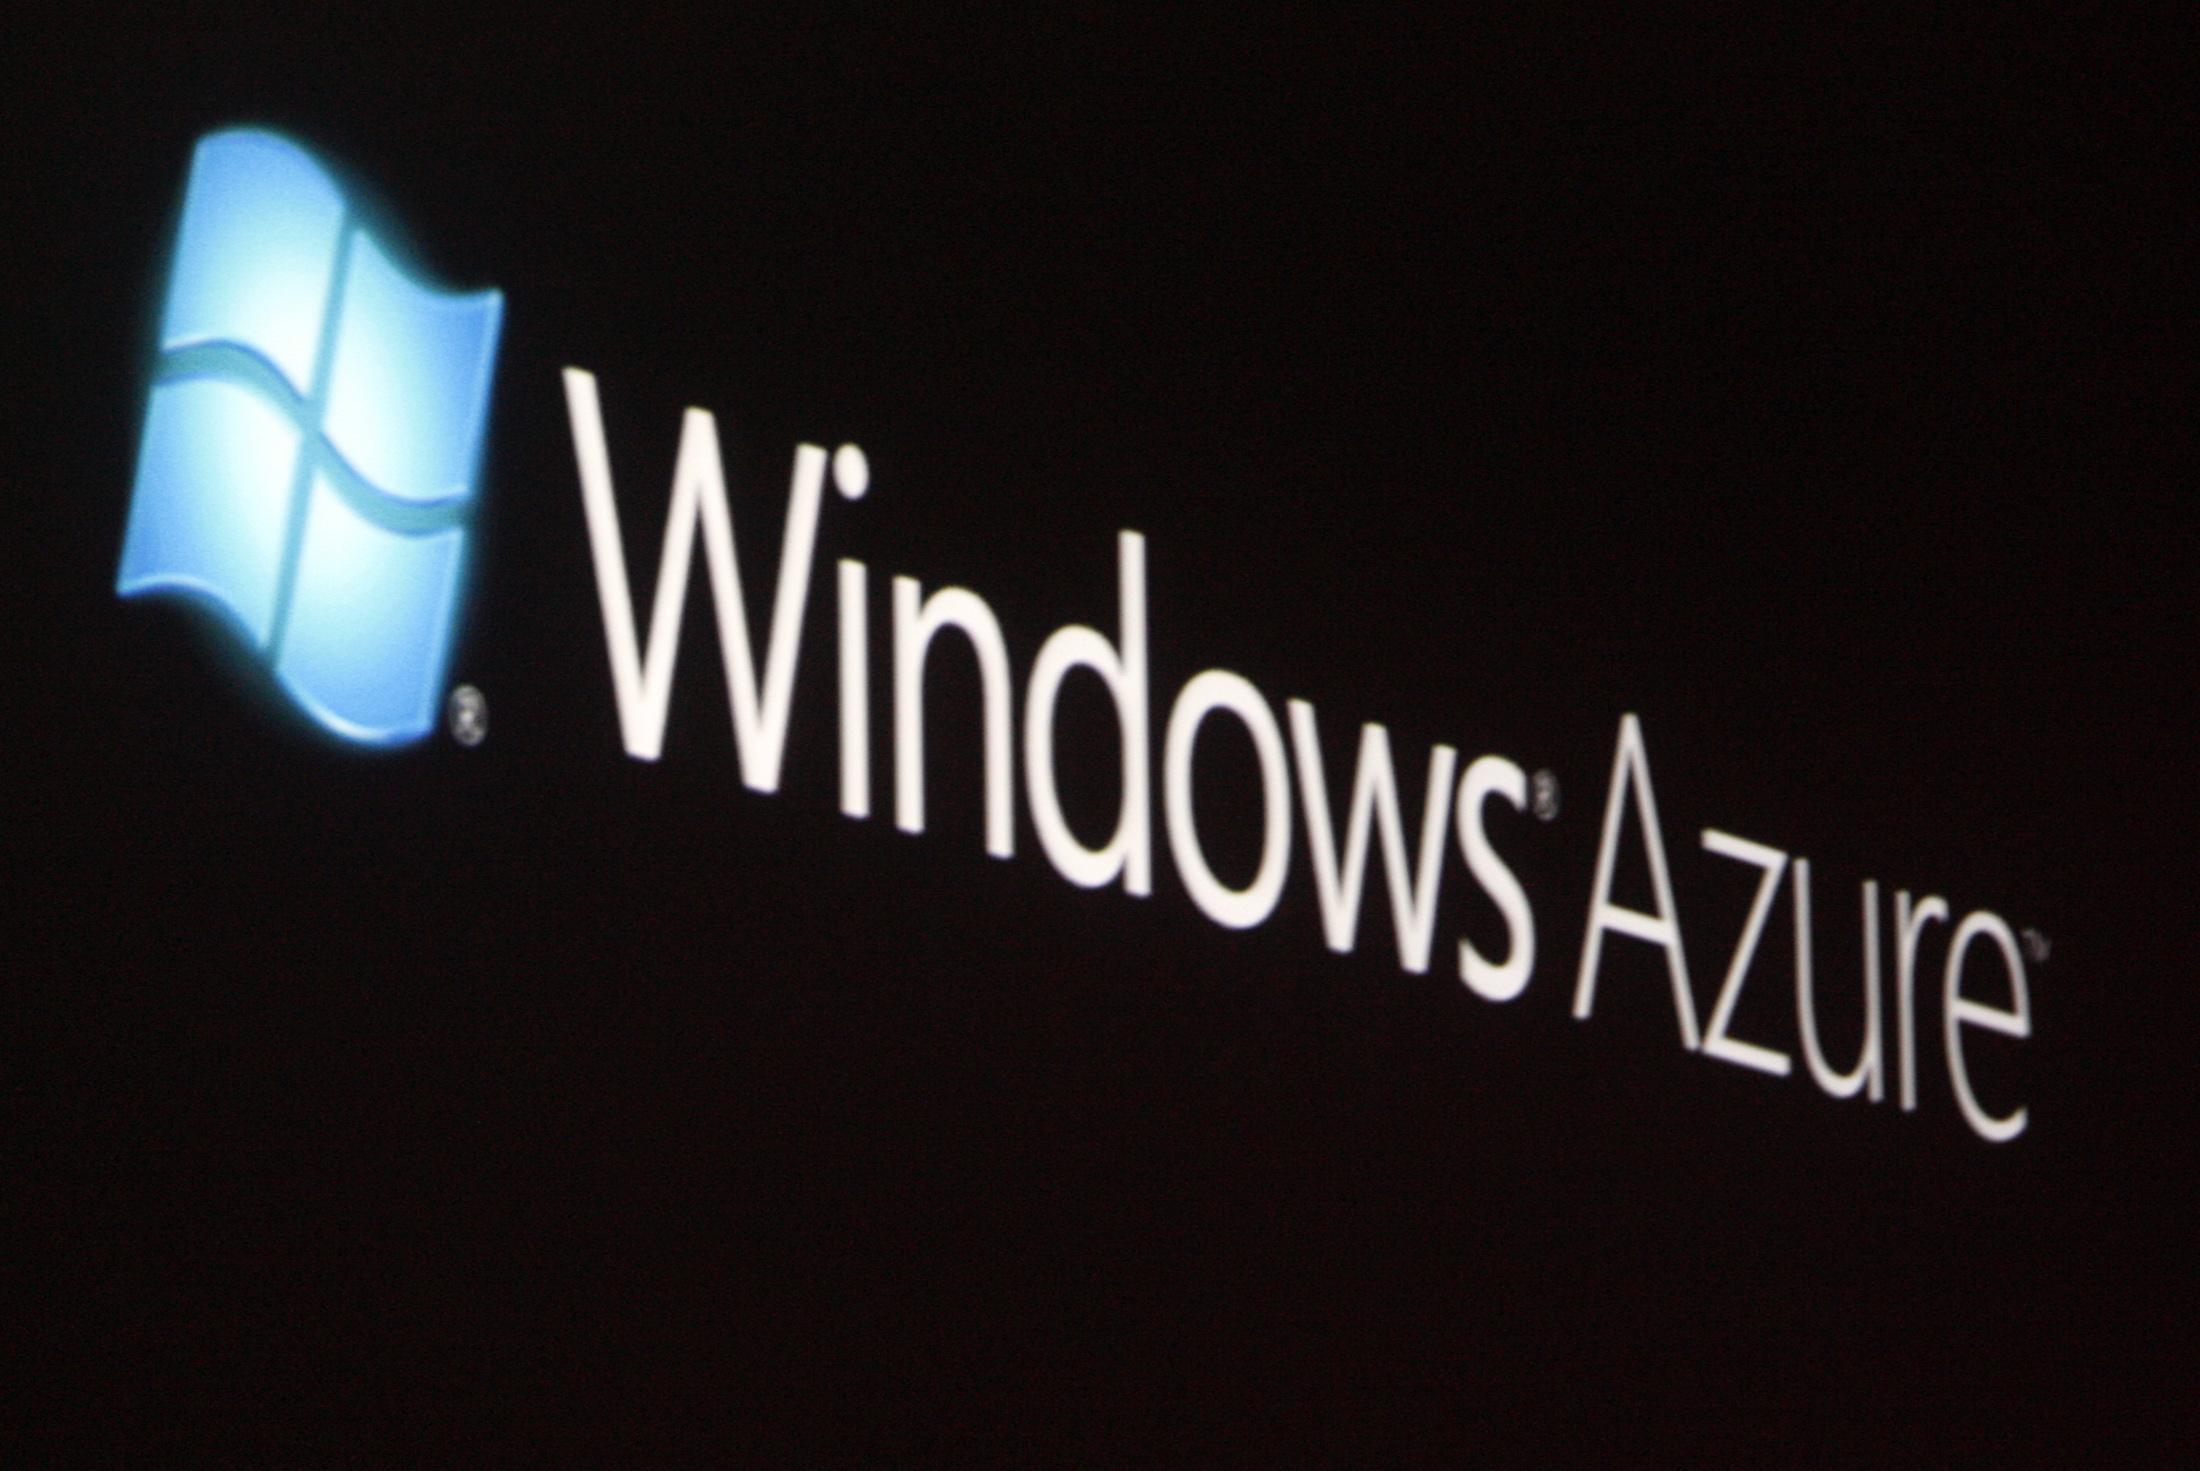 Reuters/Windows Azure